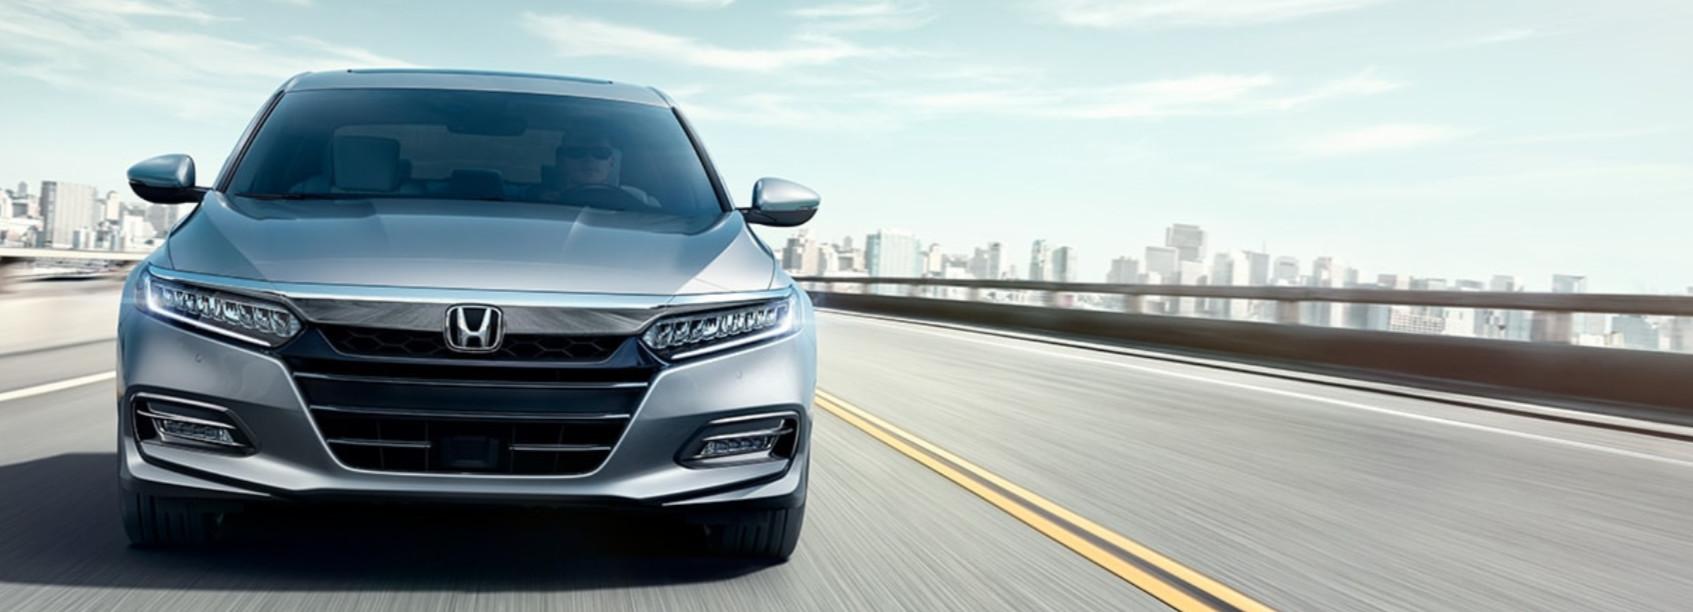 2020 Honda Accord Financing near Melbourne, FL